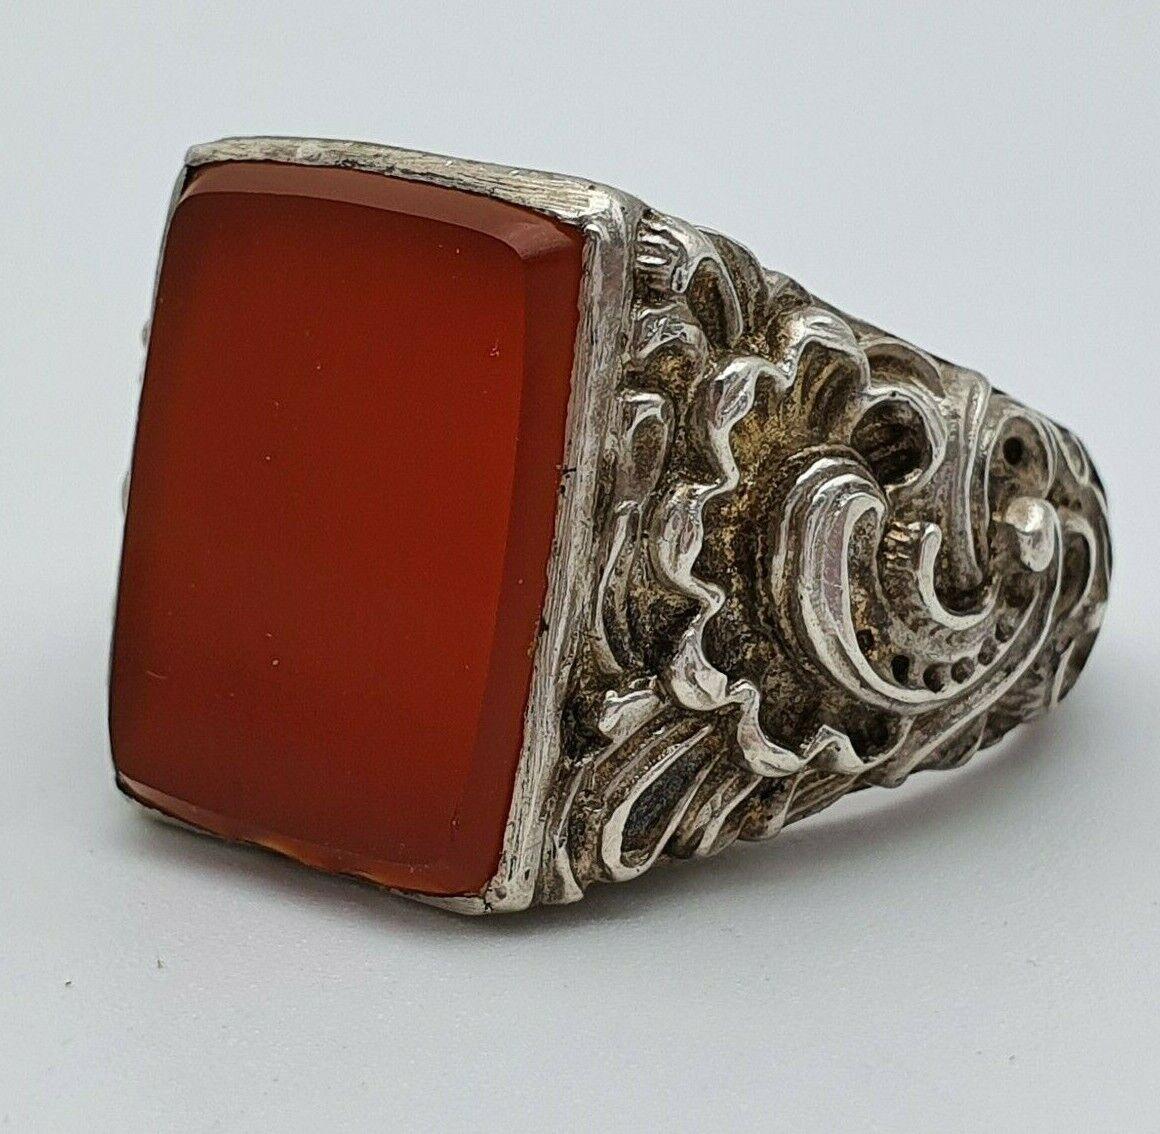 Art Deco Karneol Silber Ring Herrenring Siegelring 25.6.20